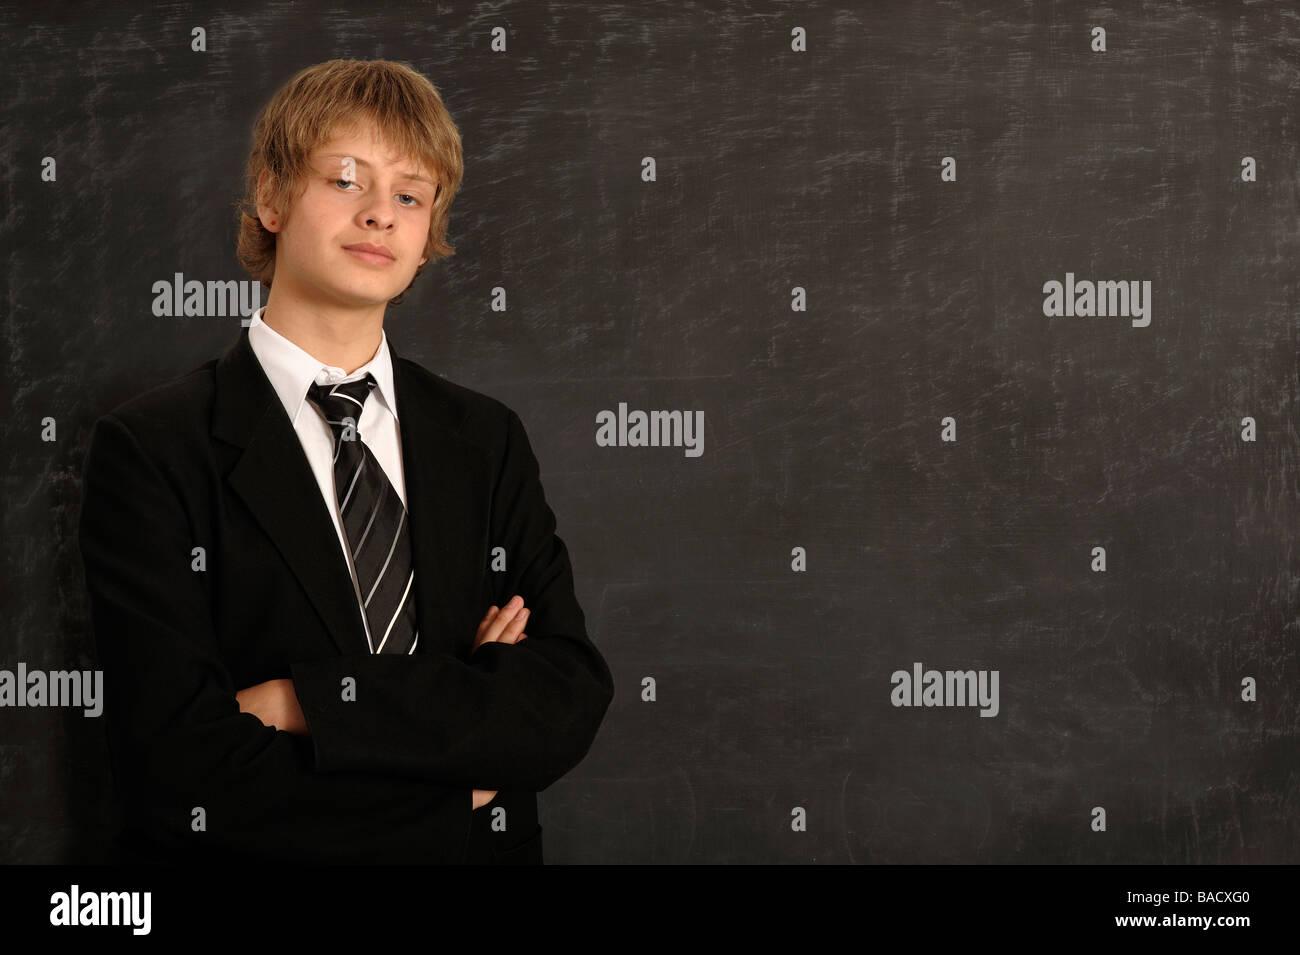 Schoolboy standing in front of a blackboard - Stock Image